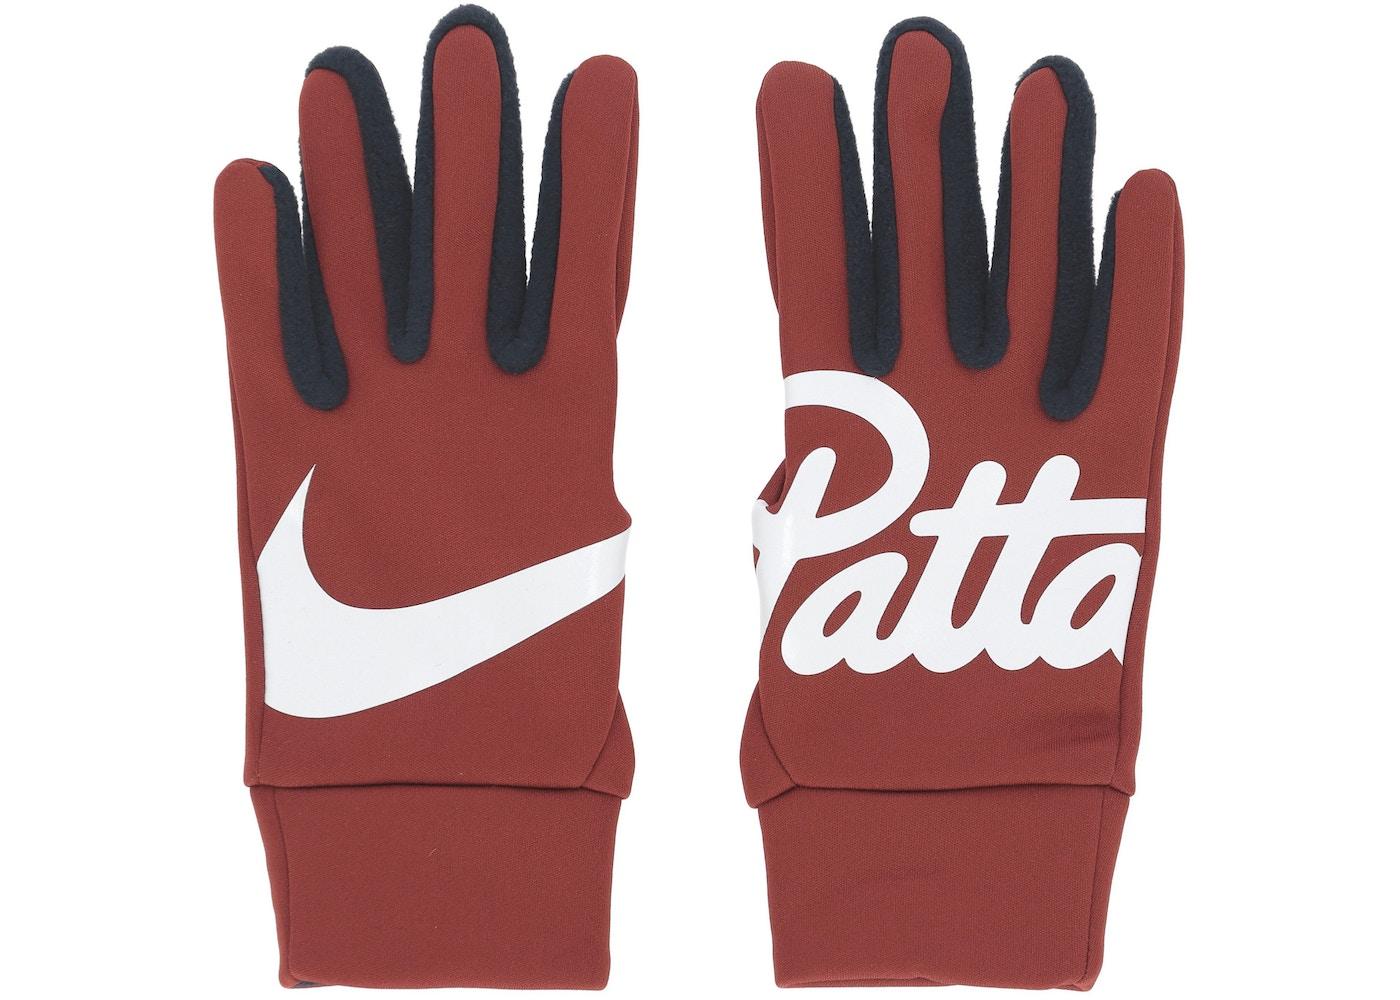 Desgastado mecanismo milicia  Nike x Patta NSW Gloves Mars Stone - FW18